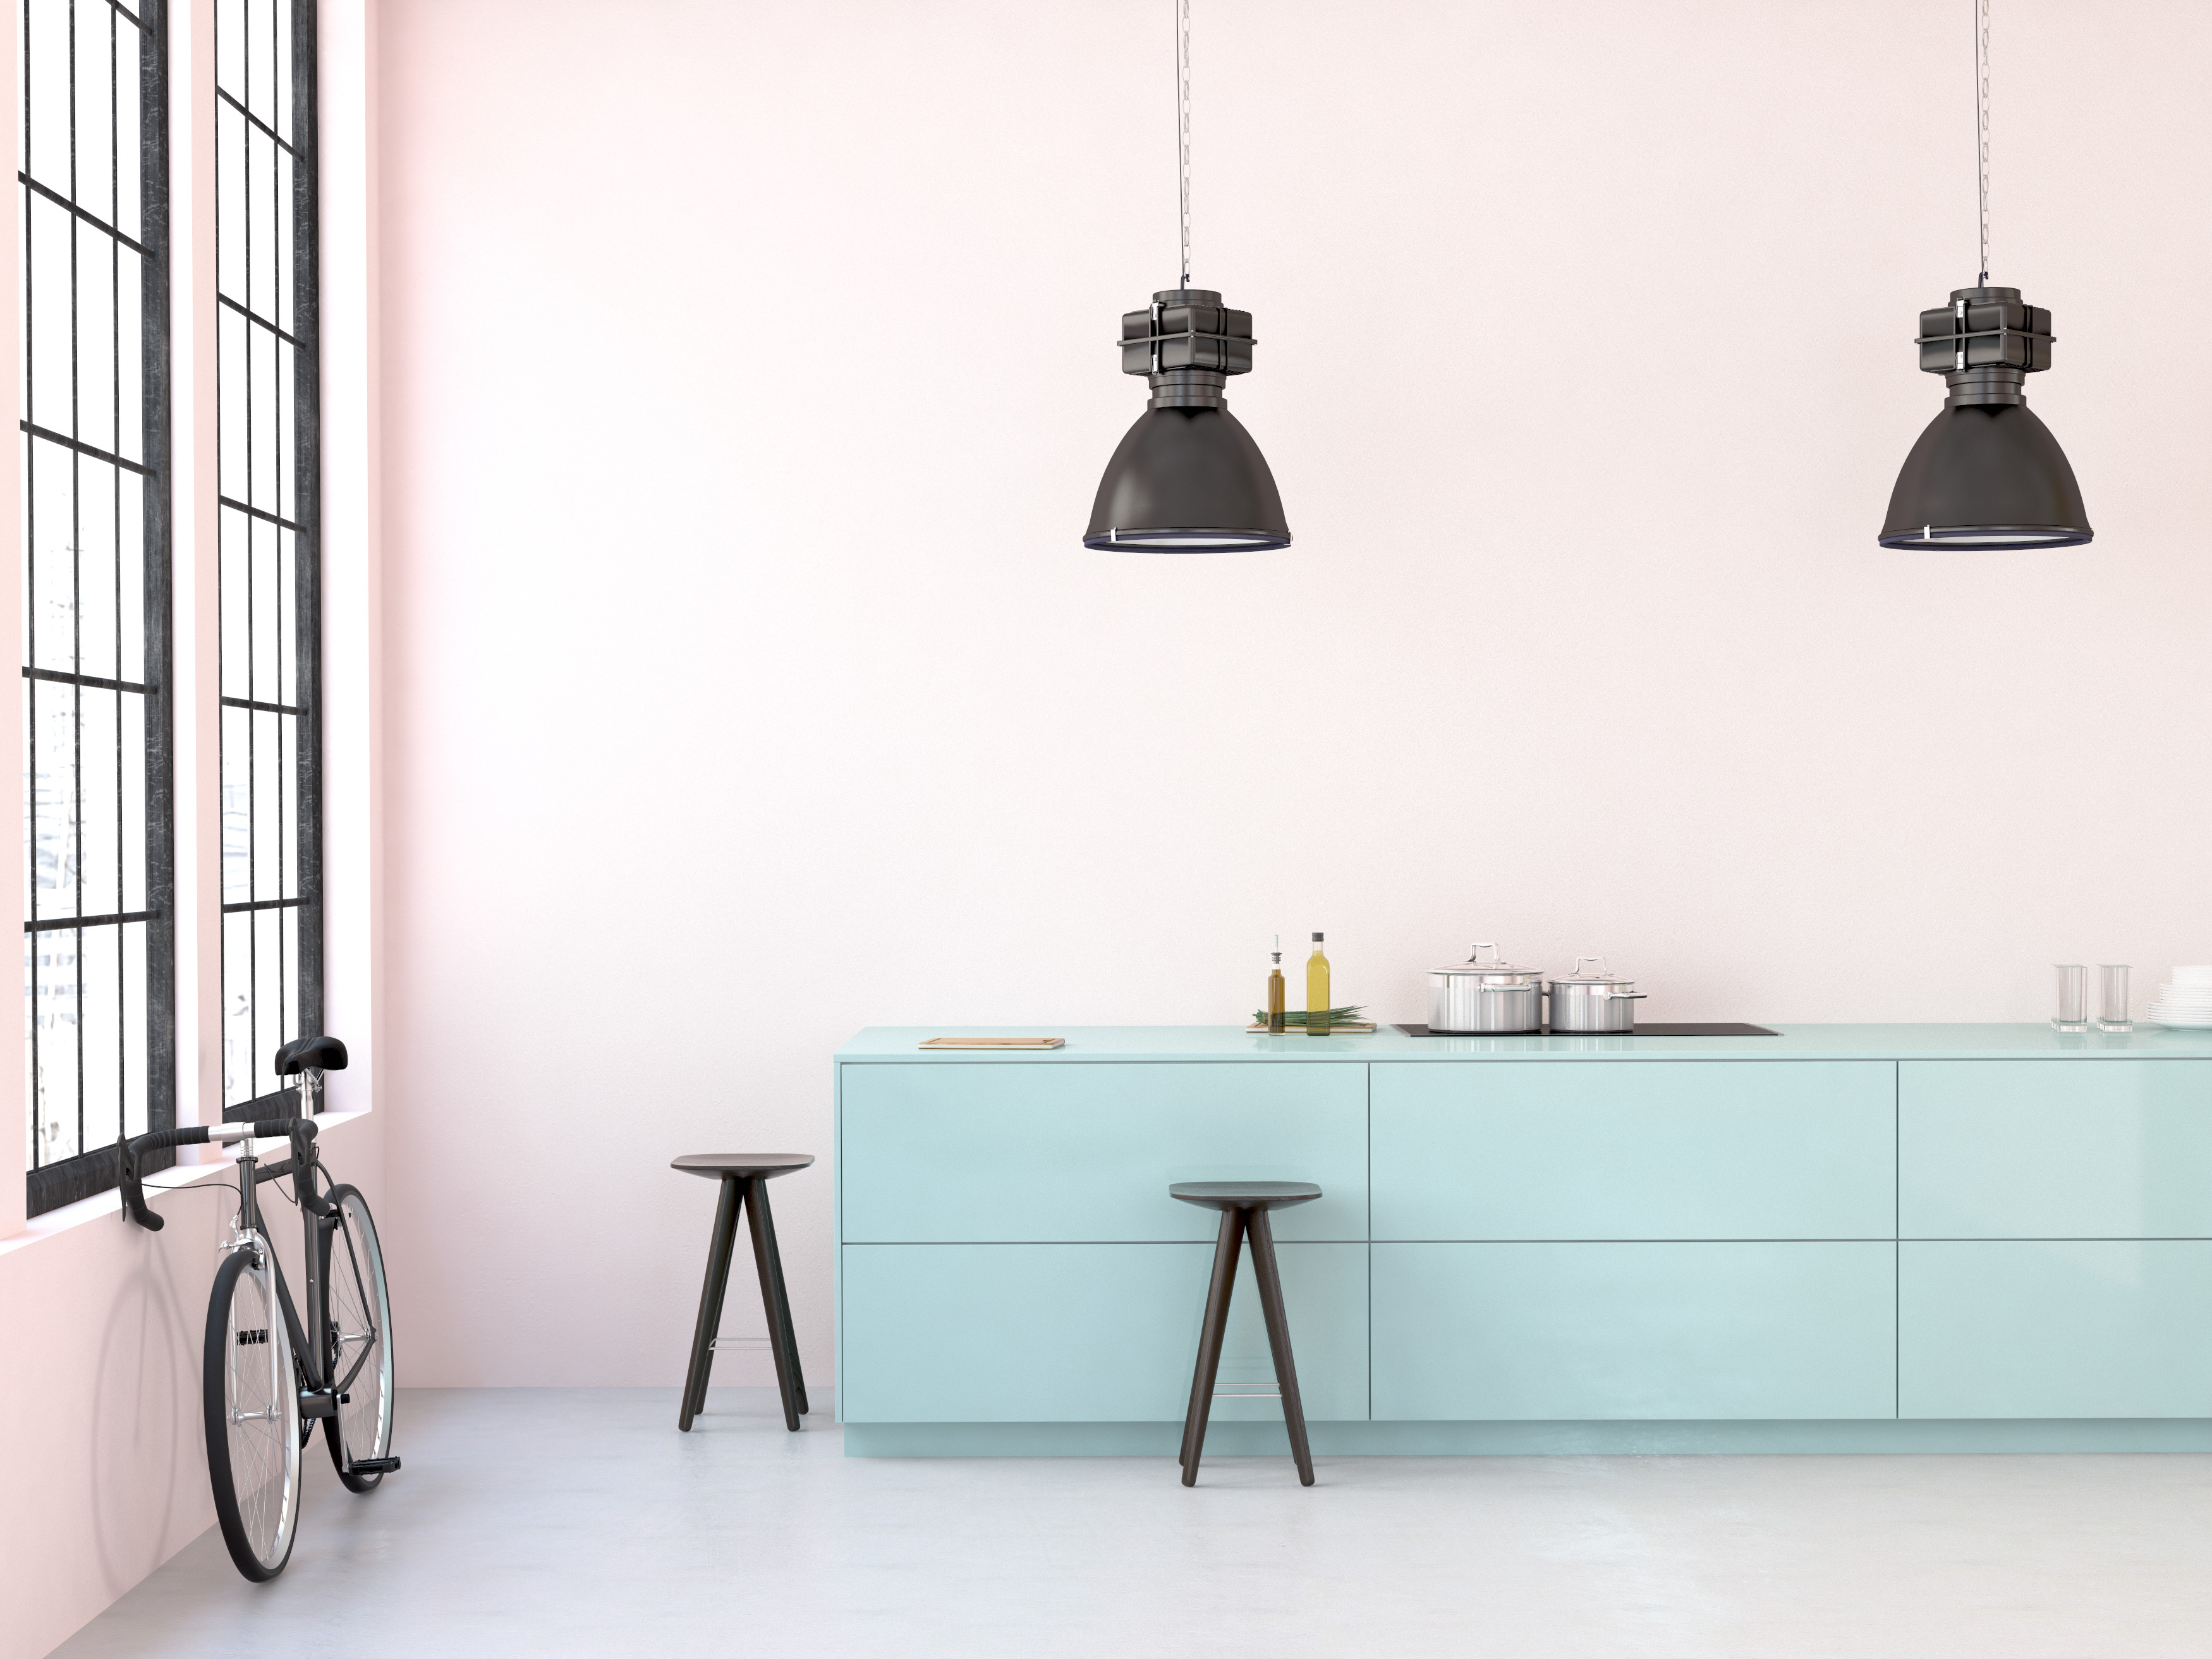 9 gestos para harmonizar a sua casa sapo lifestyle for Kleur muur